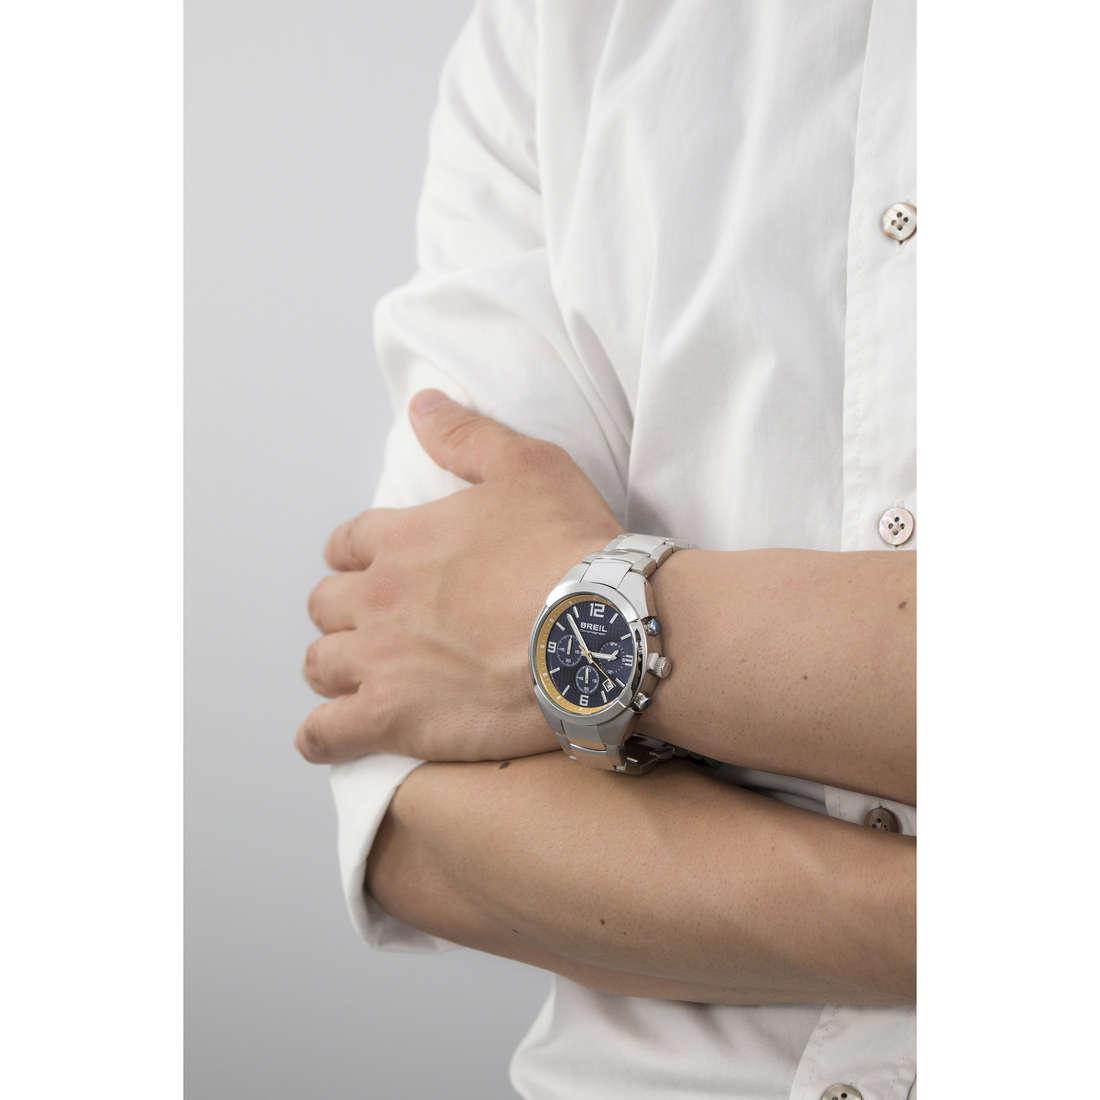 Breil cronografi Gap uomo TW1378 indosso